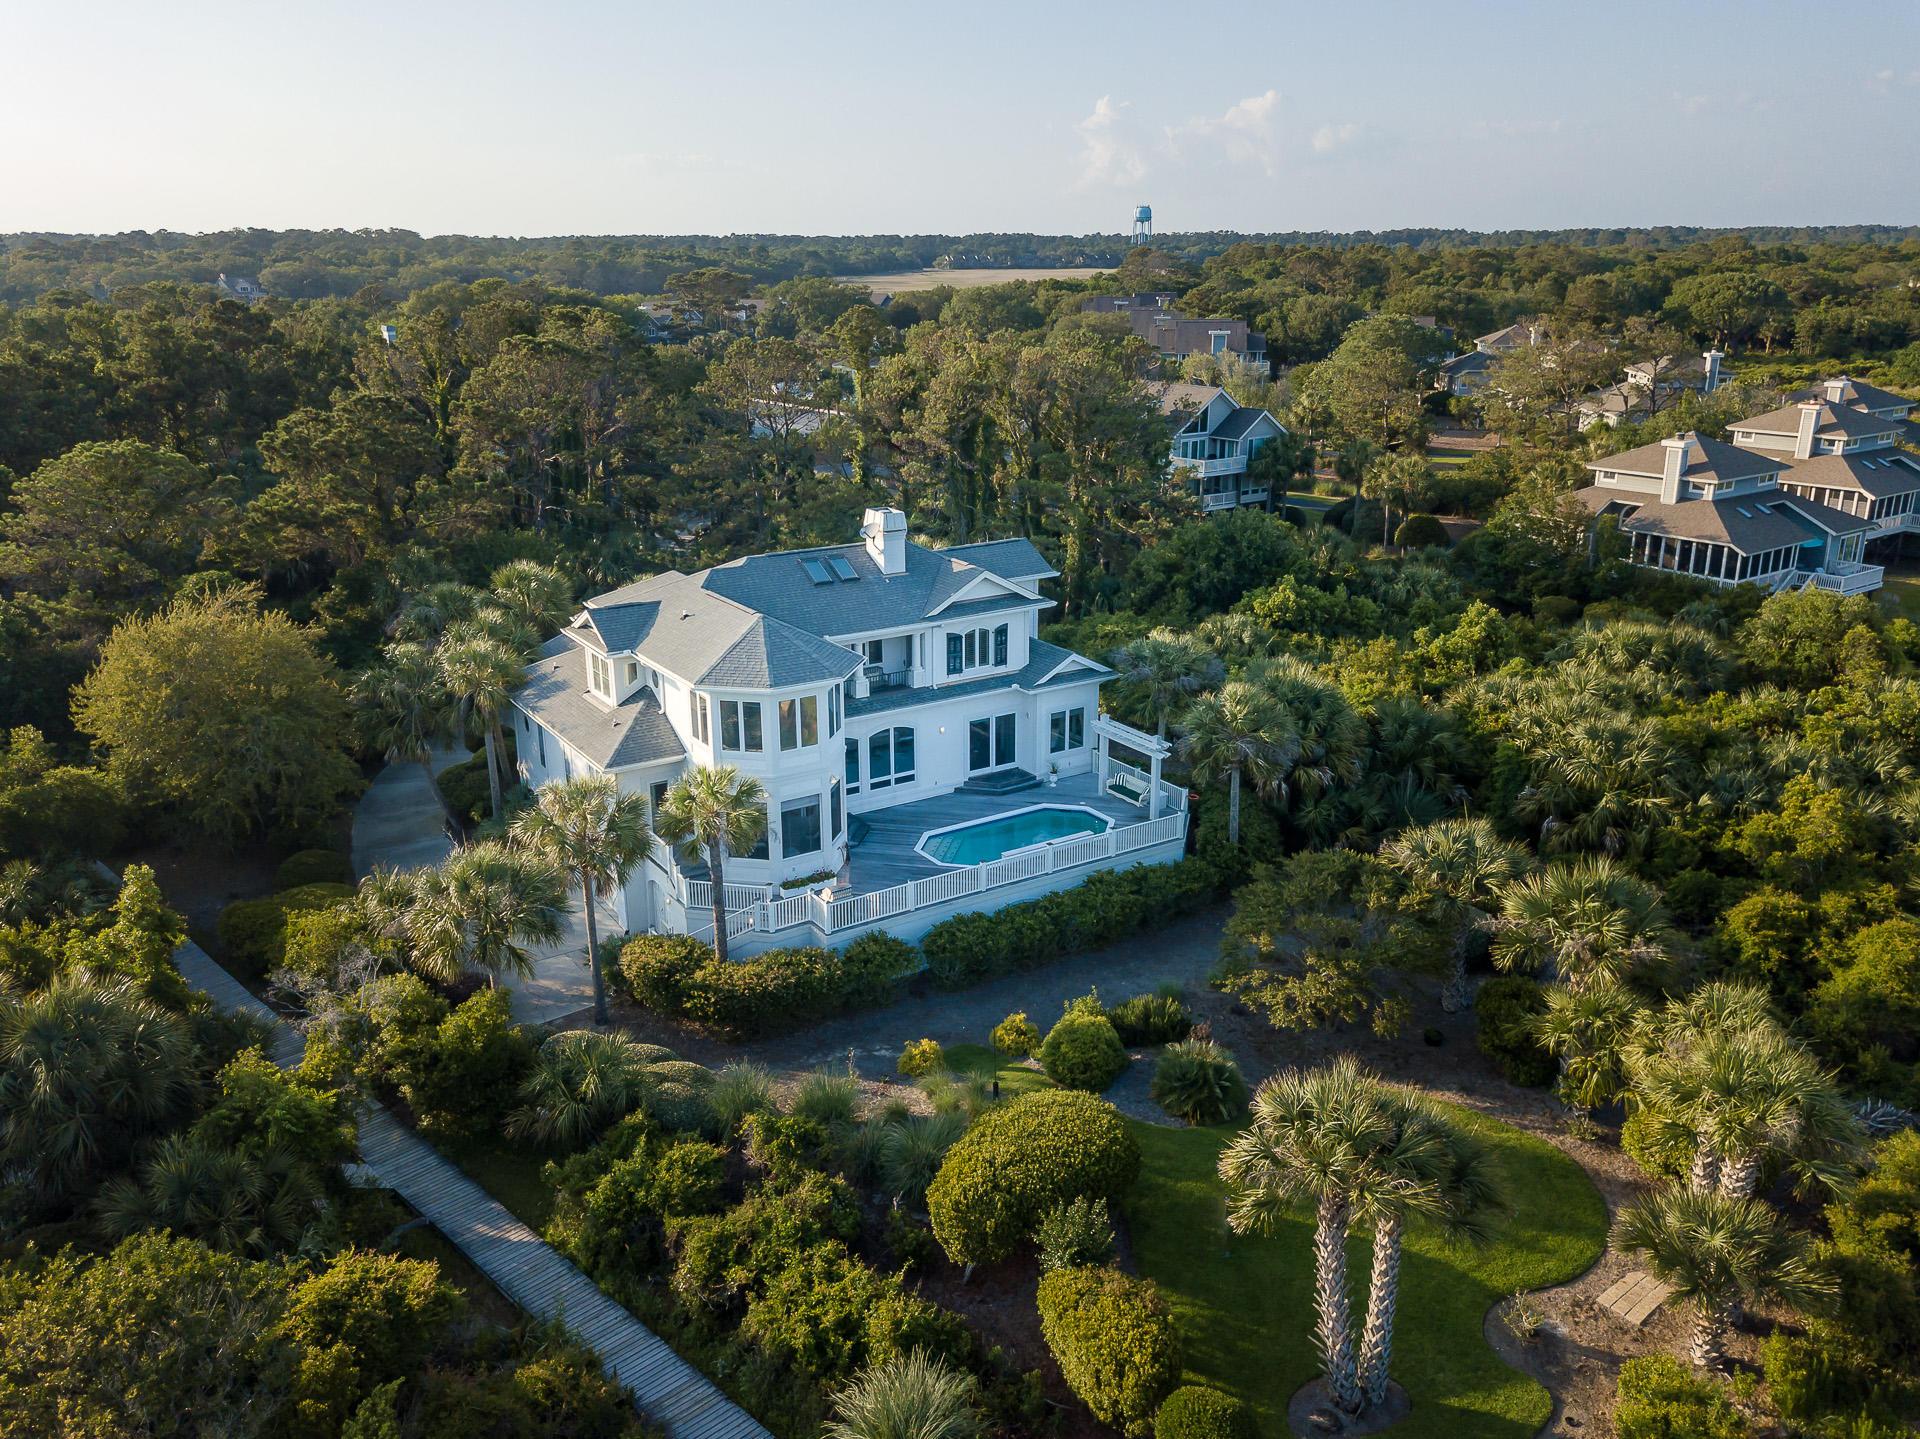 Seabrook Island Homes For Sale - 2216 Rolling Dune, Seabrook Island, SC - 8